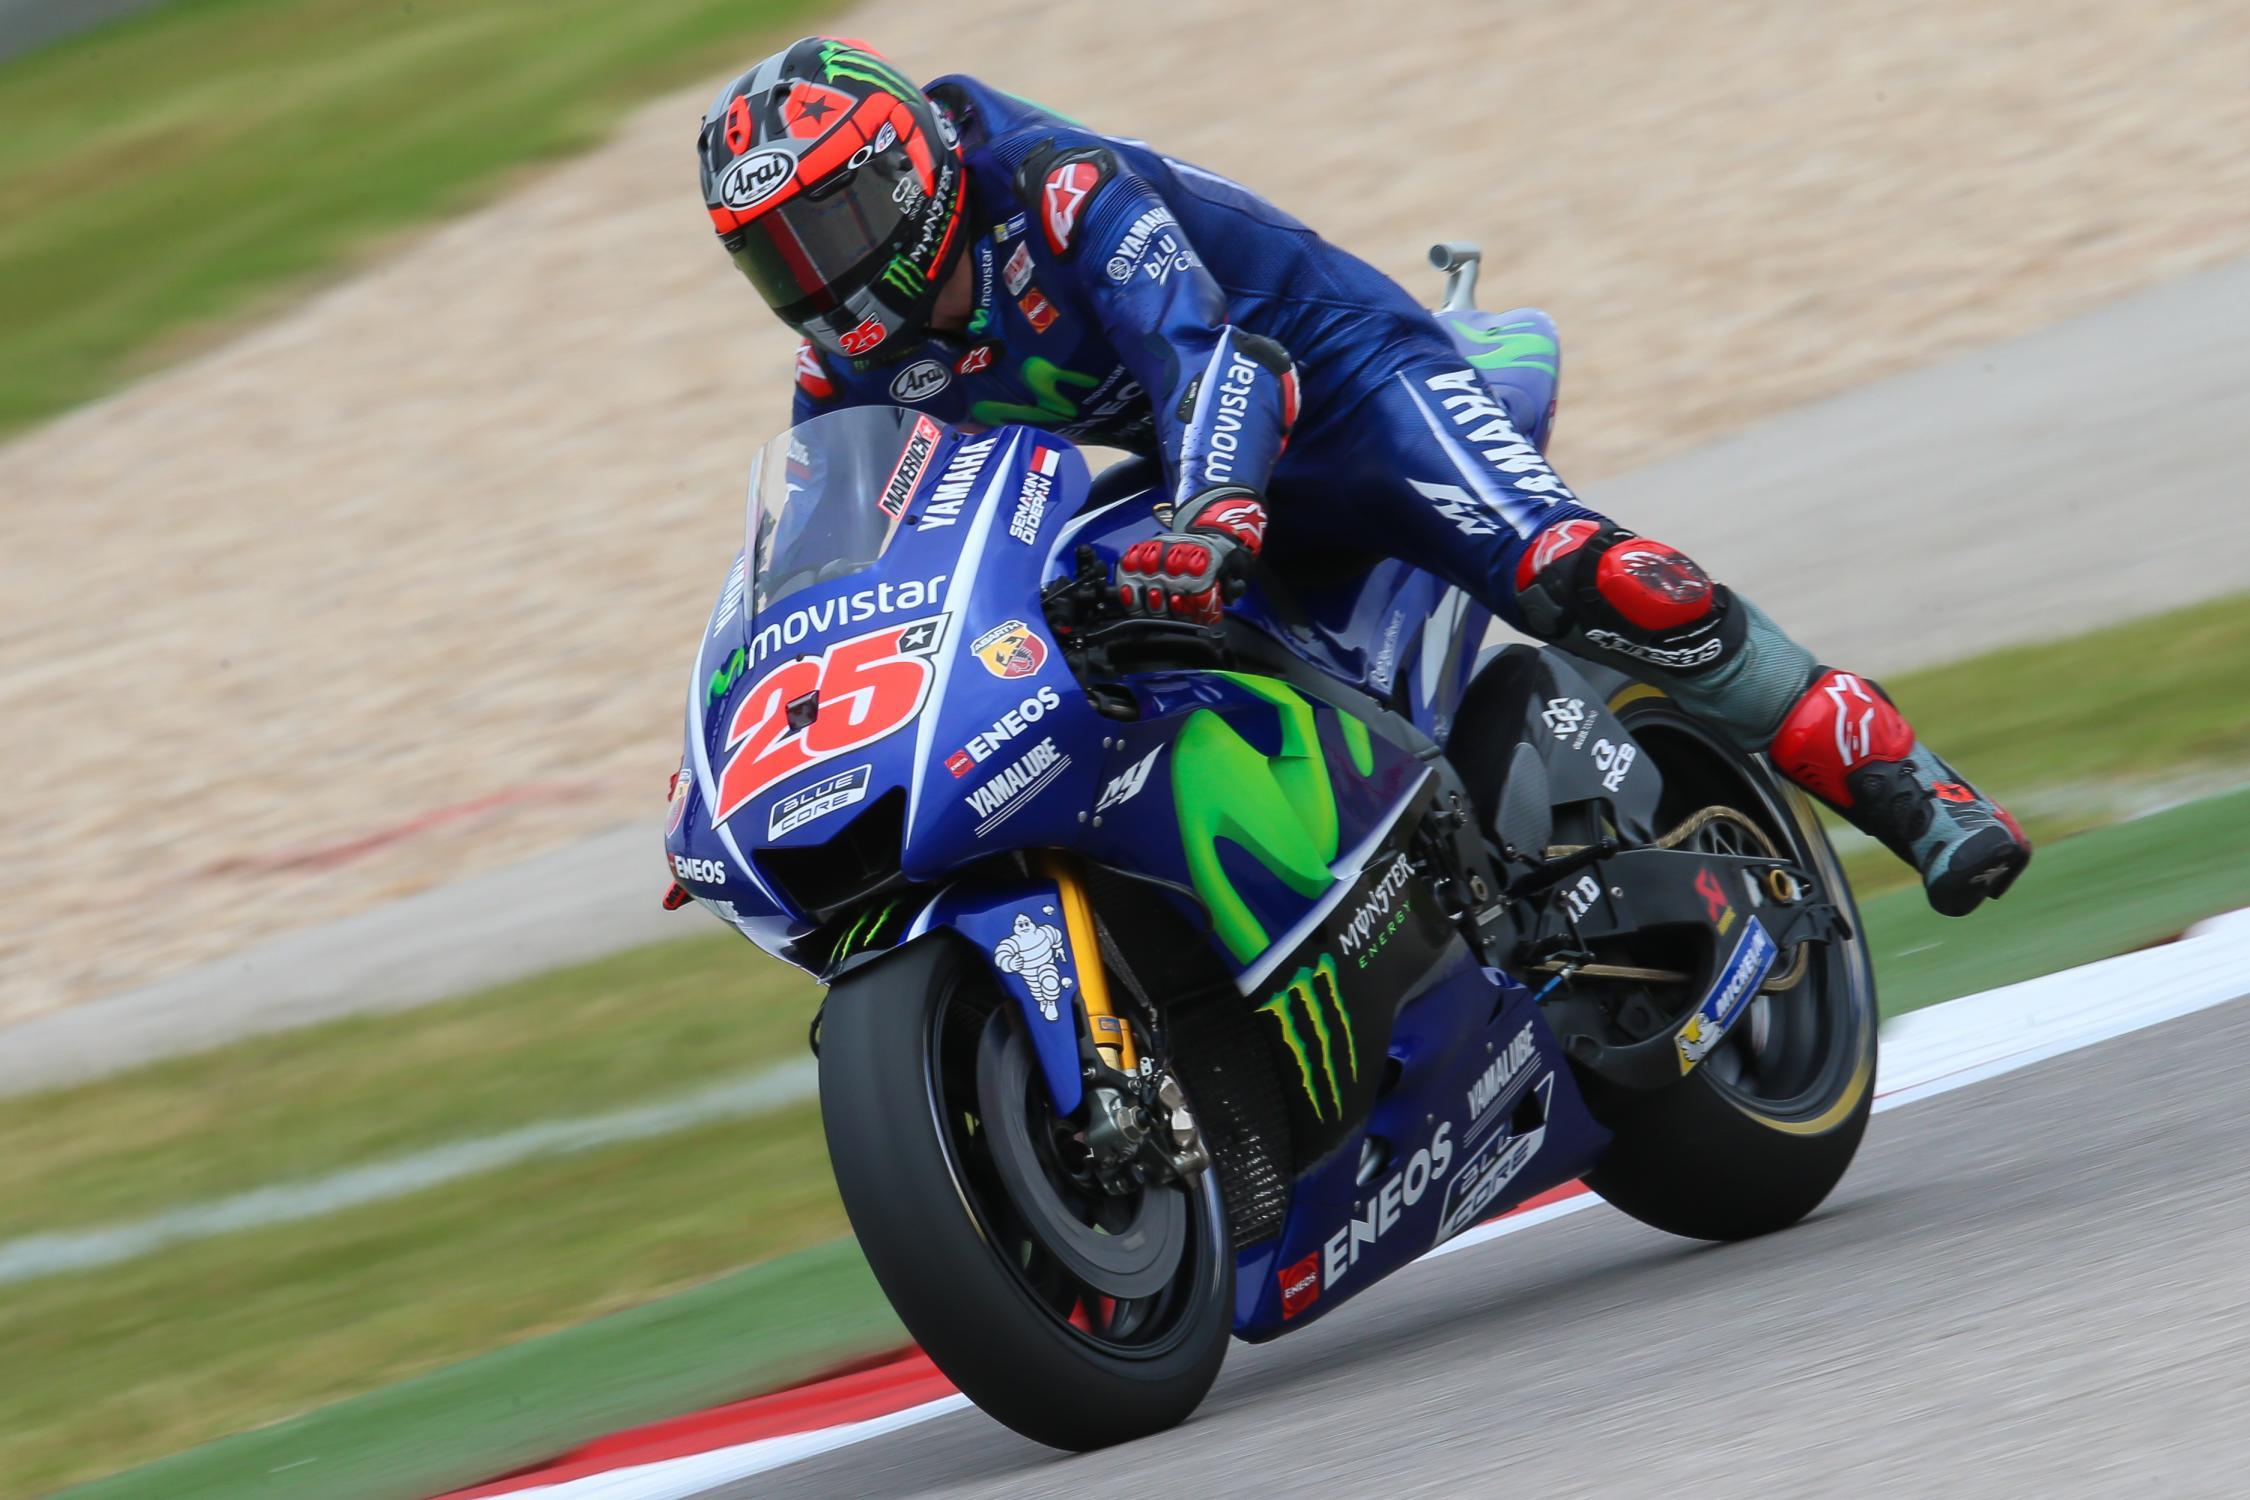 [MotoGP] Austin 25-maverick-vinales-espbl1_9856.gallery_full_top_fullscreen